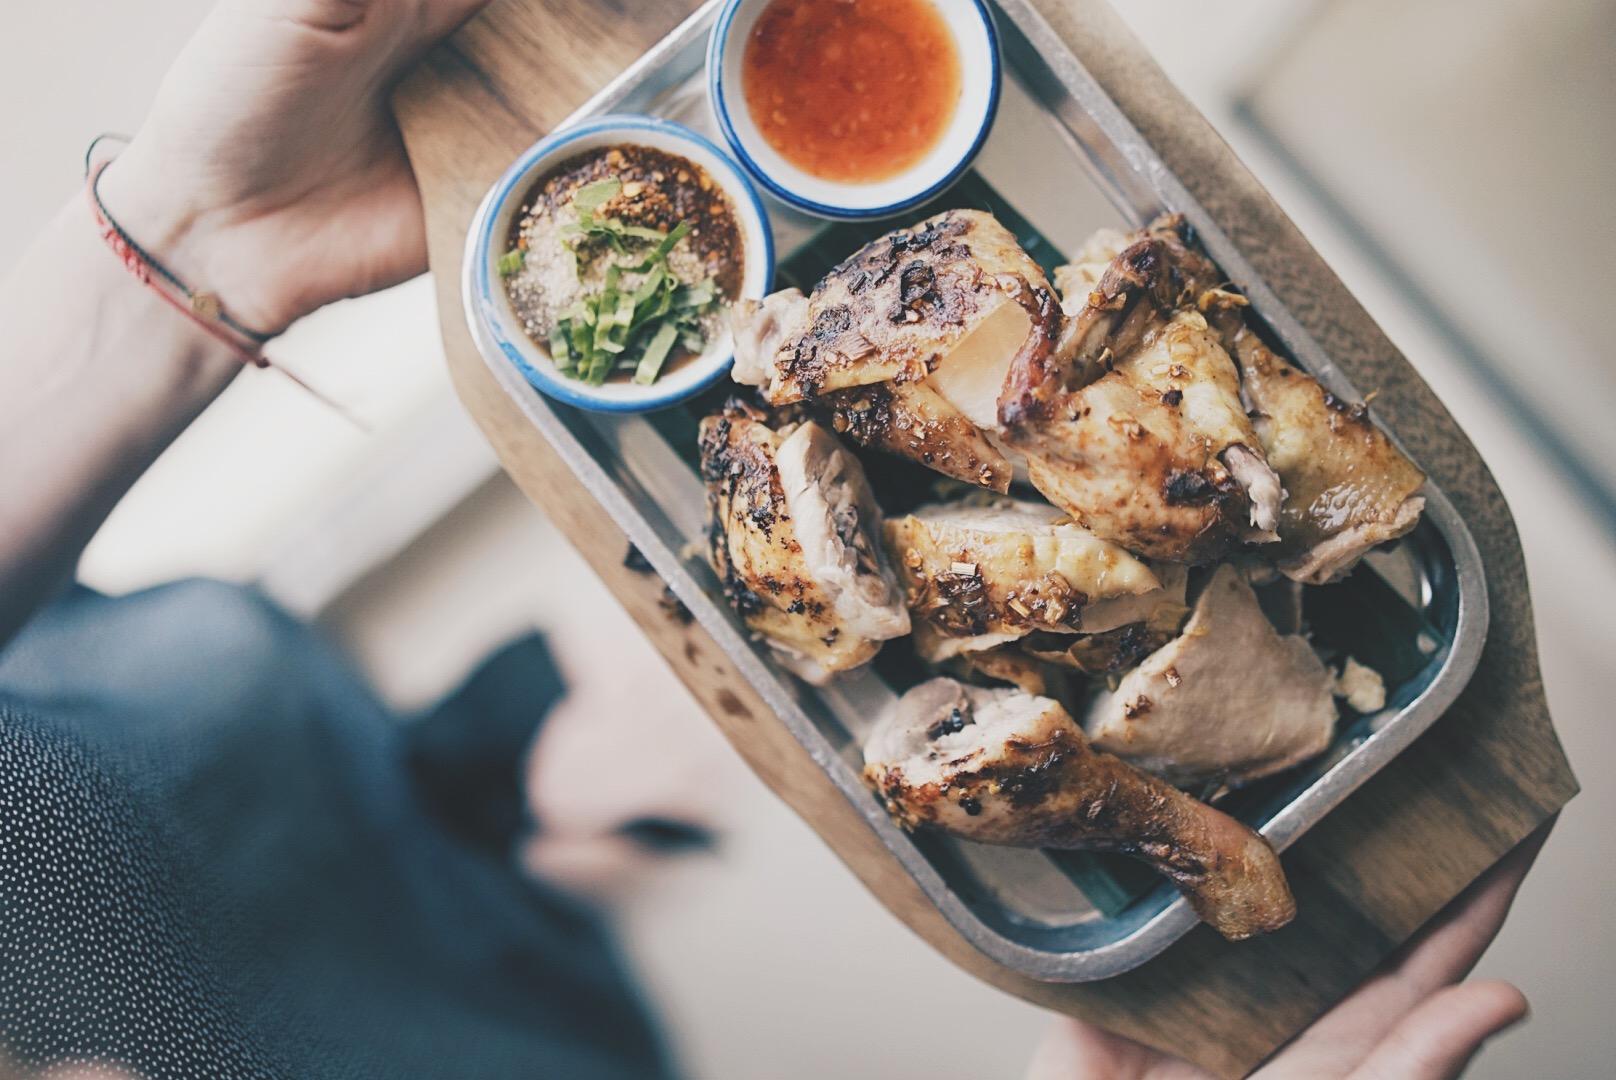 Thai food to share, here: Kai Yaang